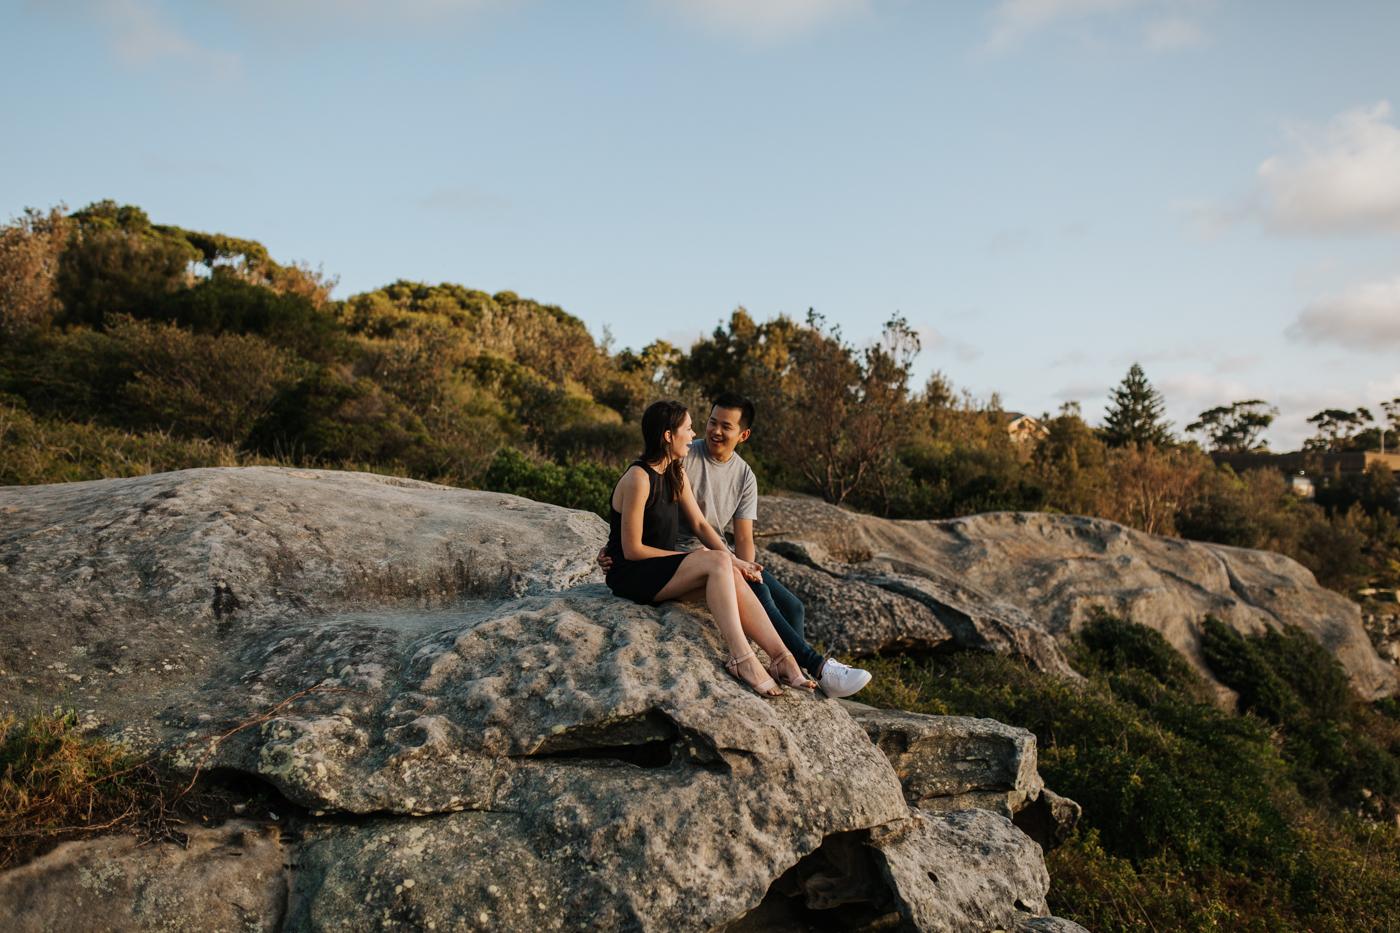 James & Caitie Engagement - Watsons Bay - Samantha Heather Photography-47.jpg